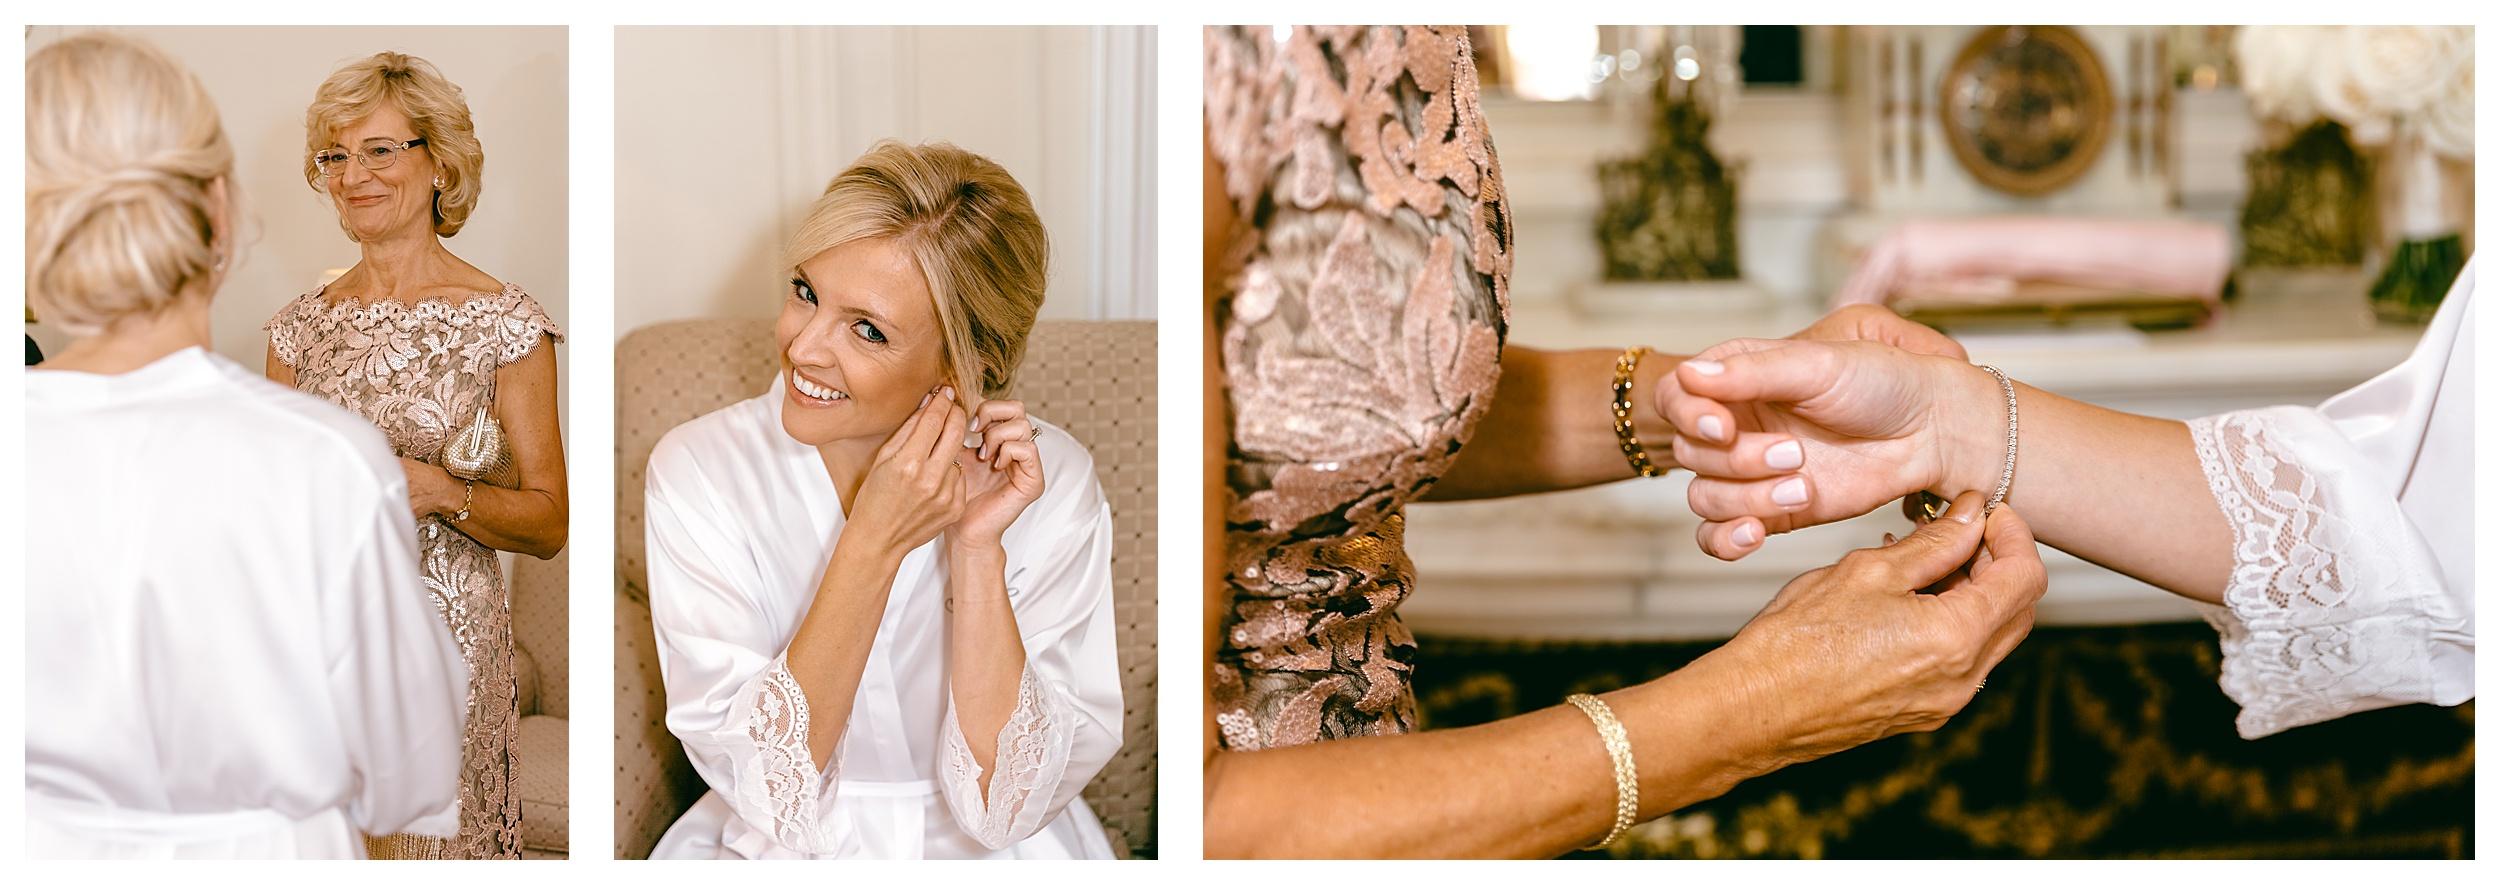 bride puts on earrings and bracelet